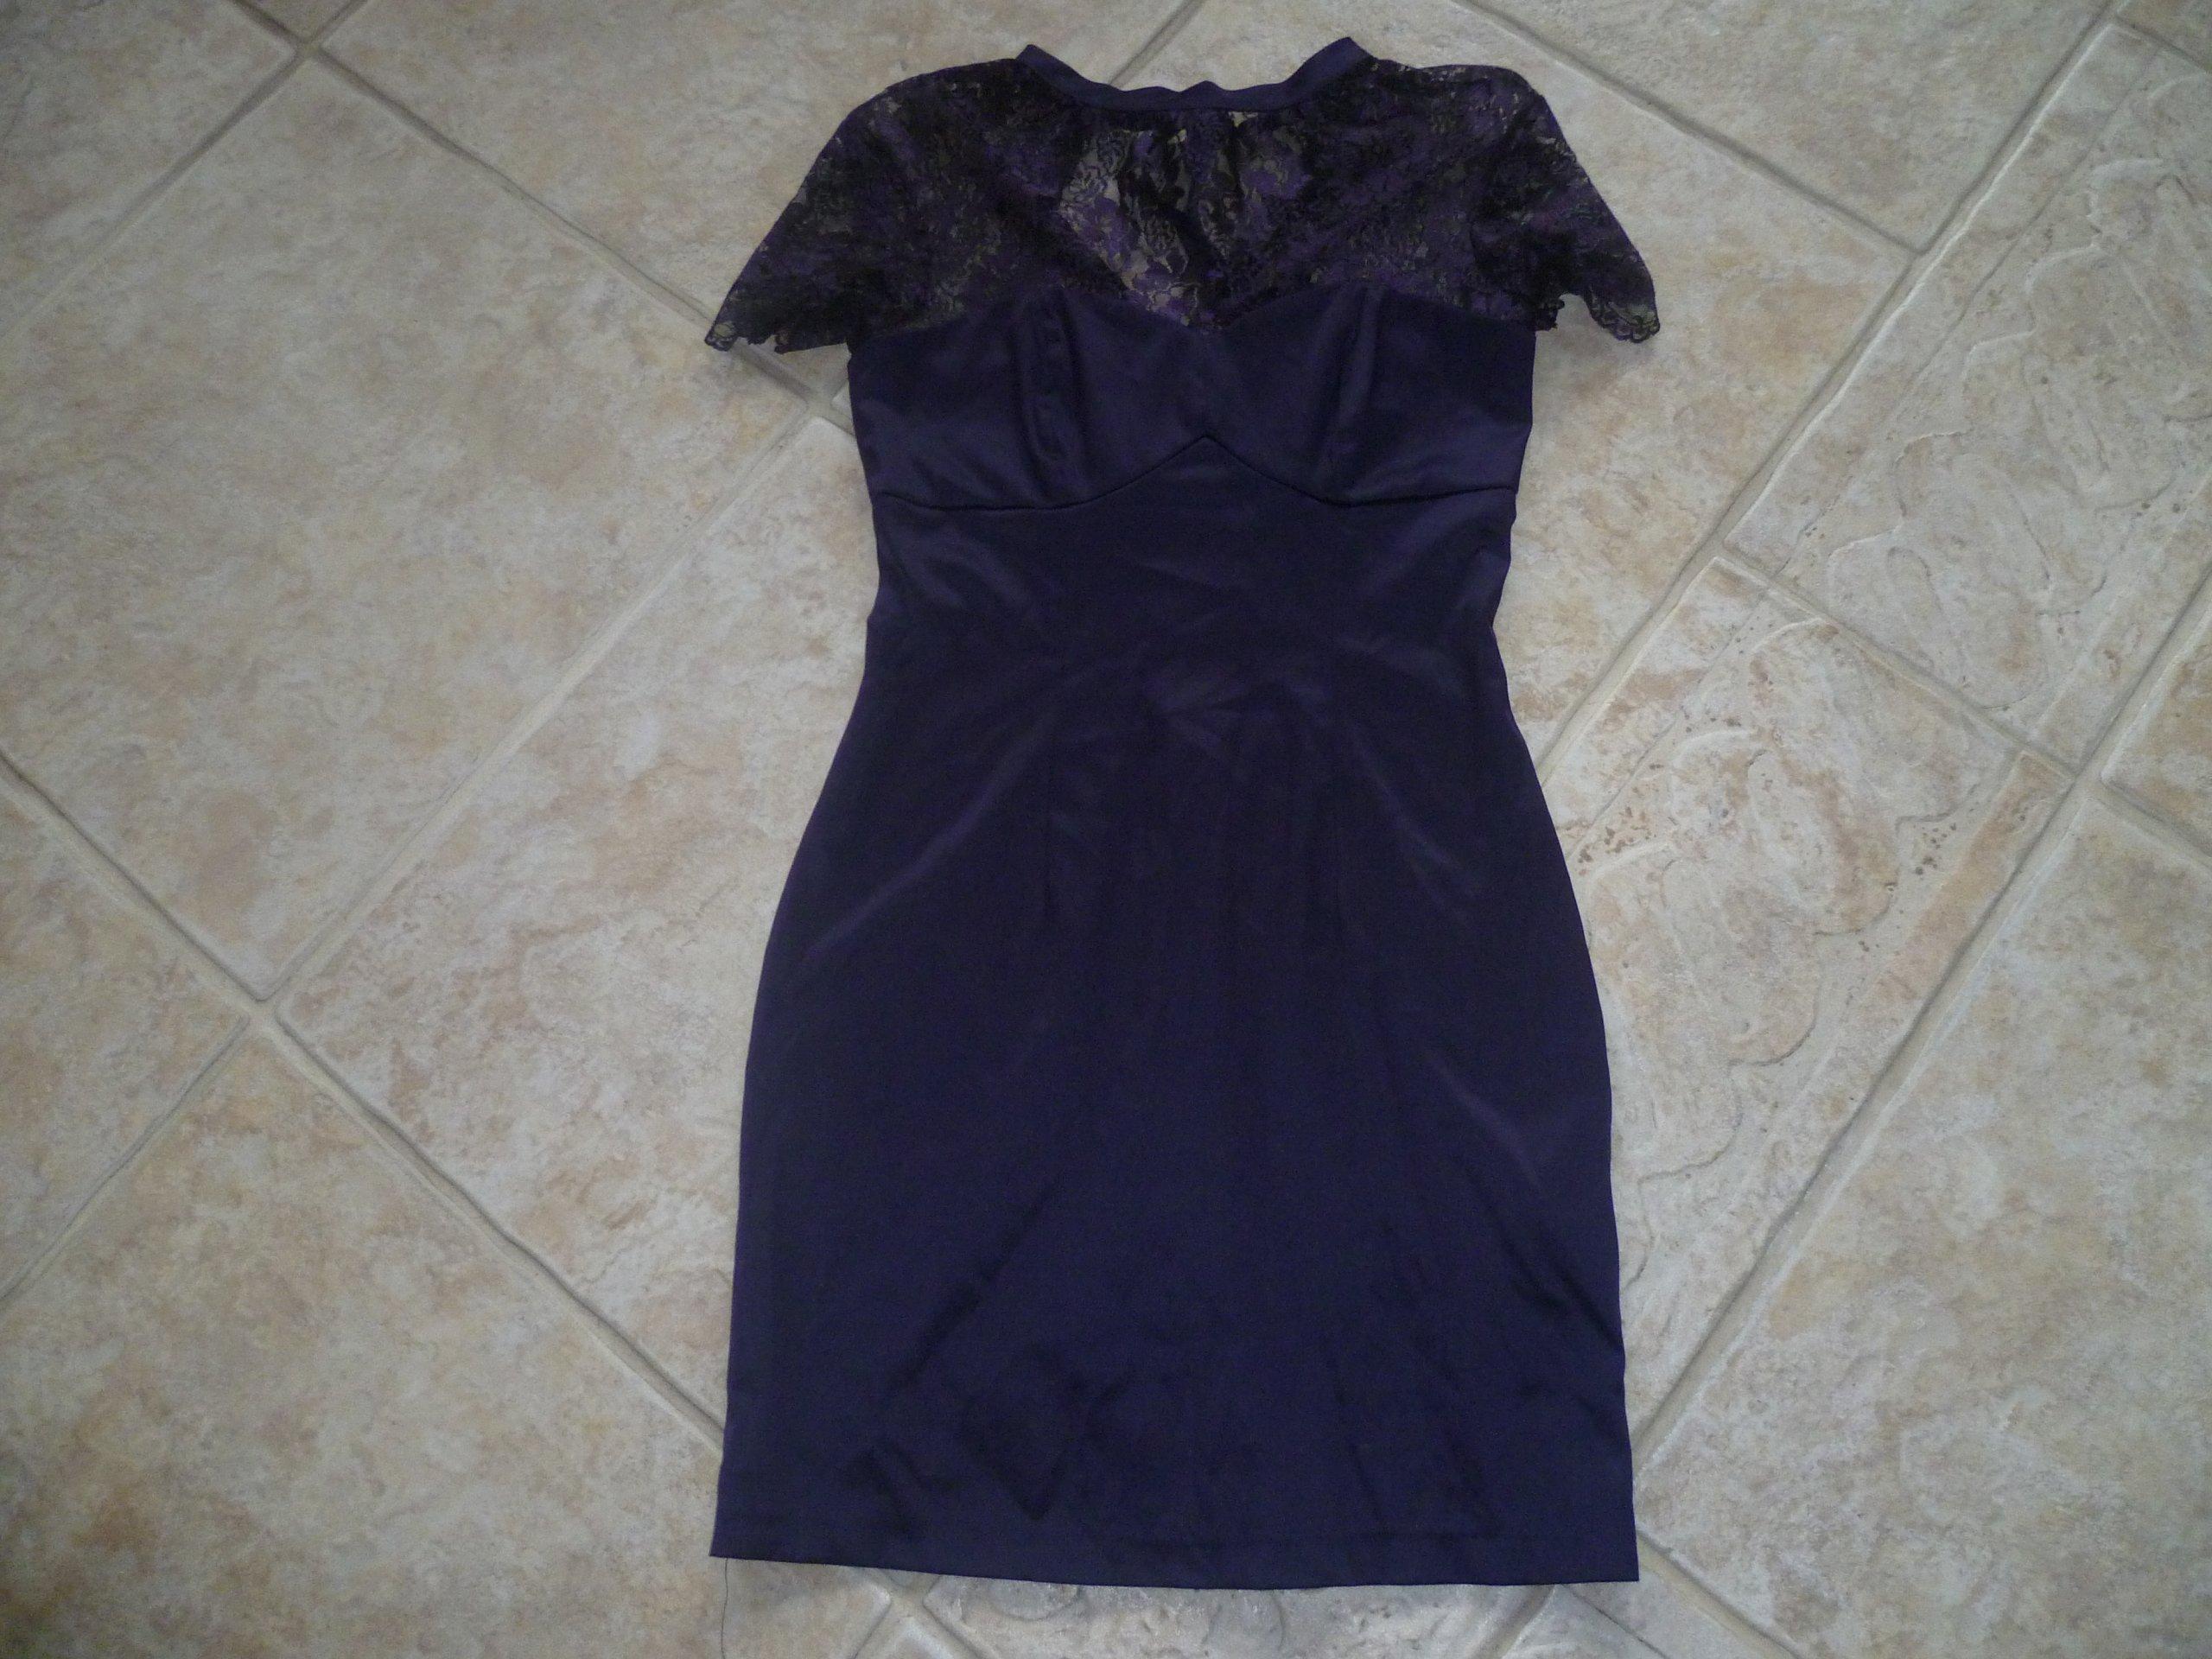 c135fcc965 Sukienka Closet rozmiar 38 - 7031735920 - oficjalne archiwum allegro